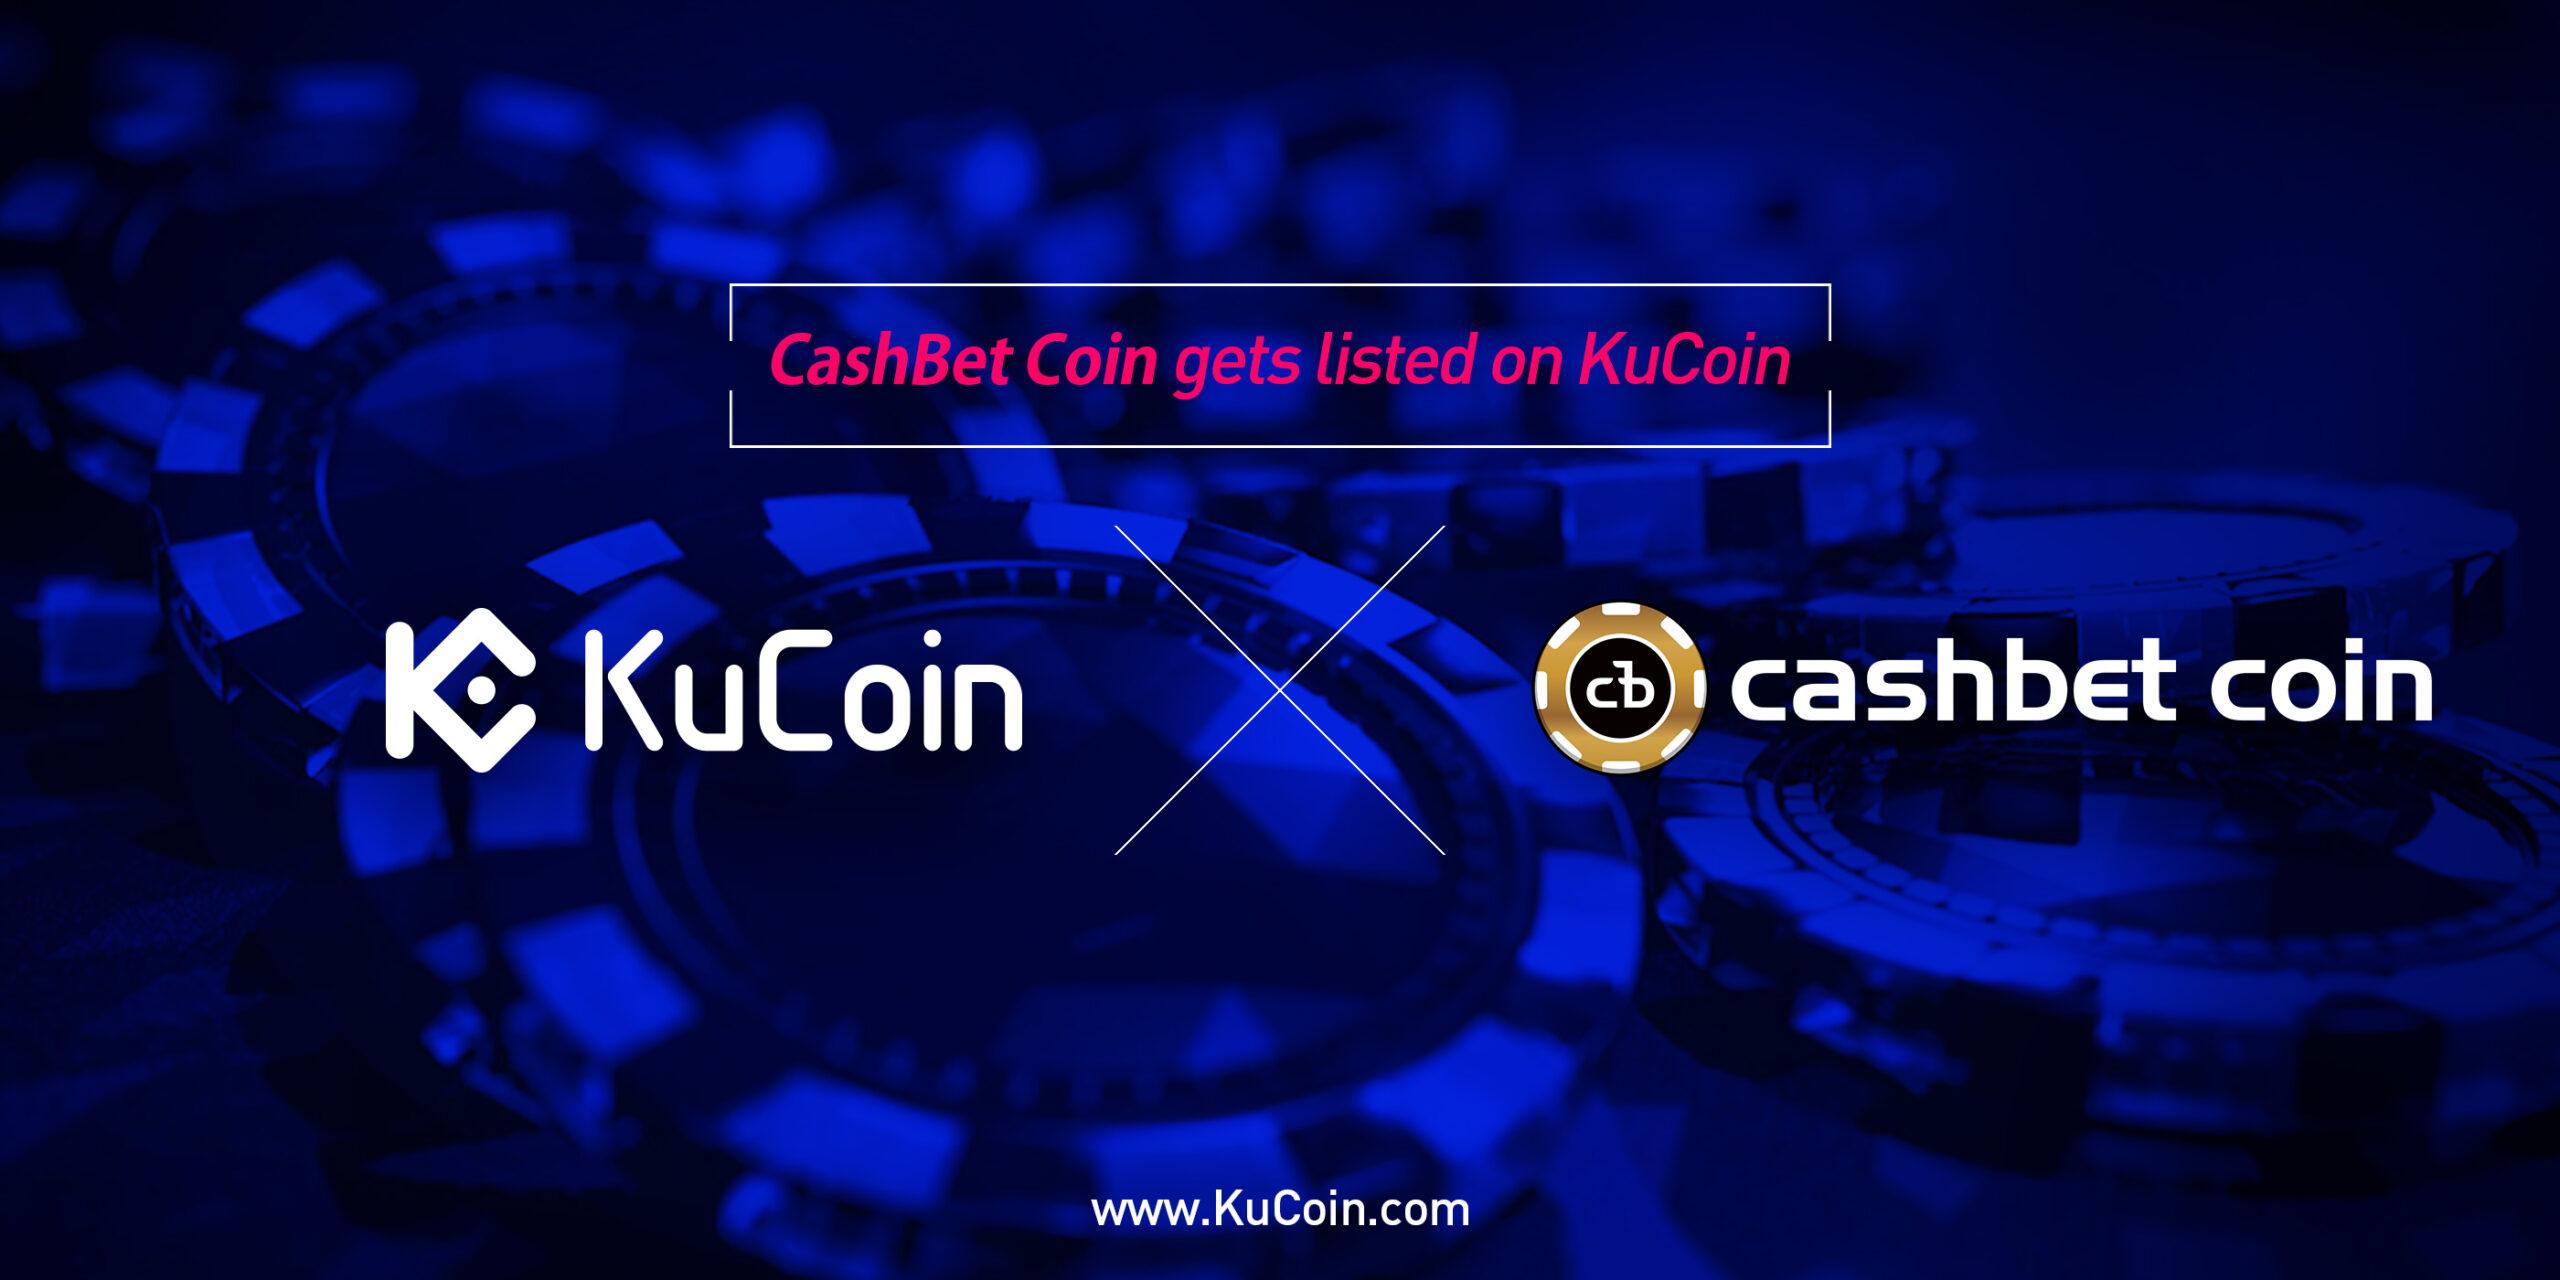 KuCoinds adds CashBet | Cashbet on KuCoin | CBC on Kucoin | Kucoin updates